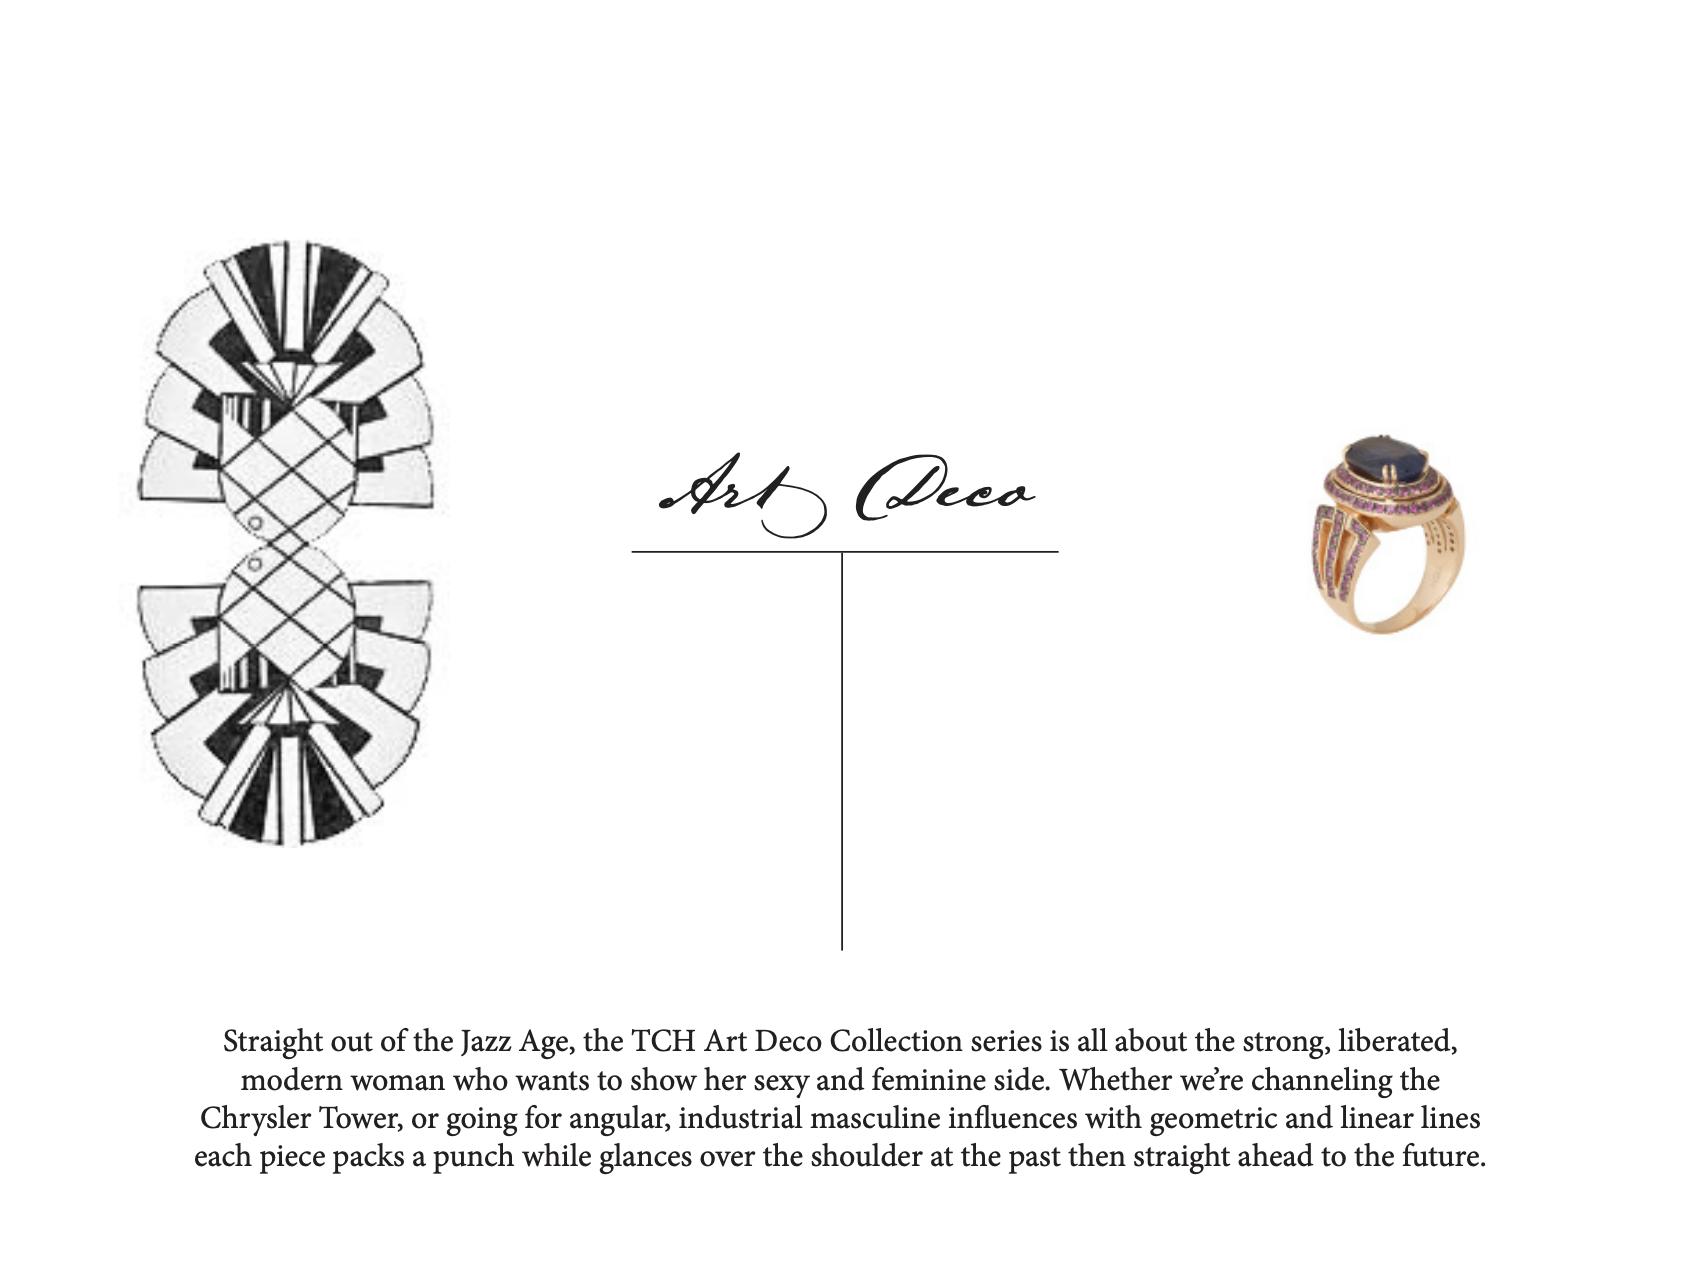 republic of toma jewelry - press kit design sarah pottharst 14.png